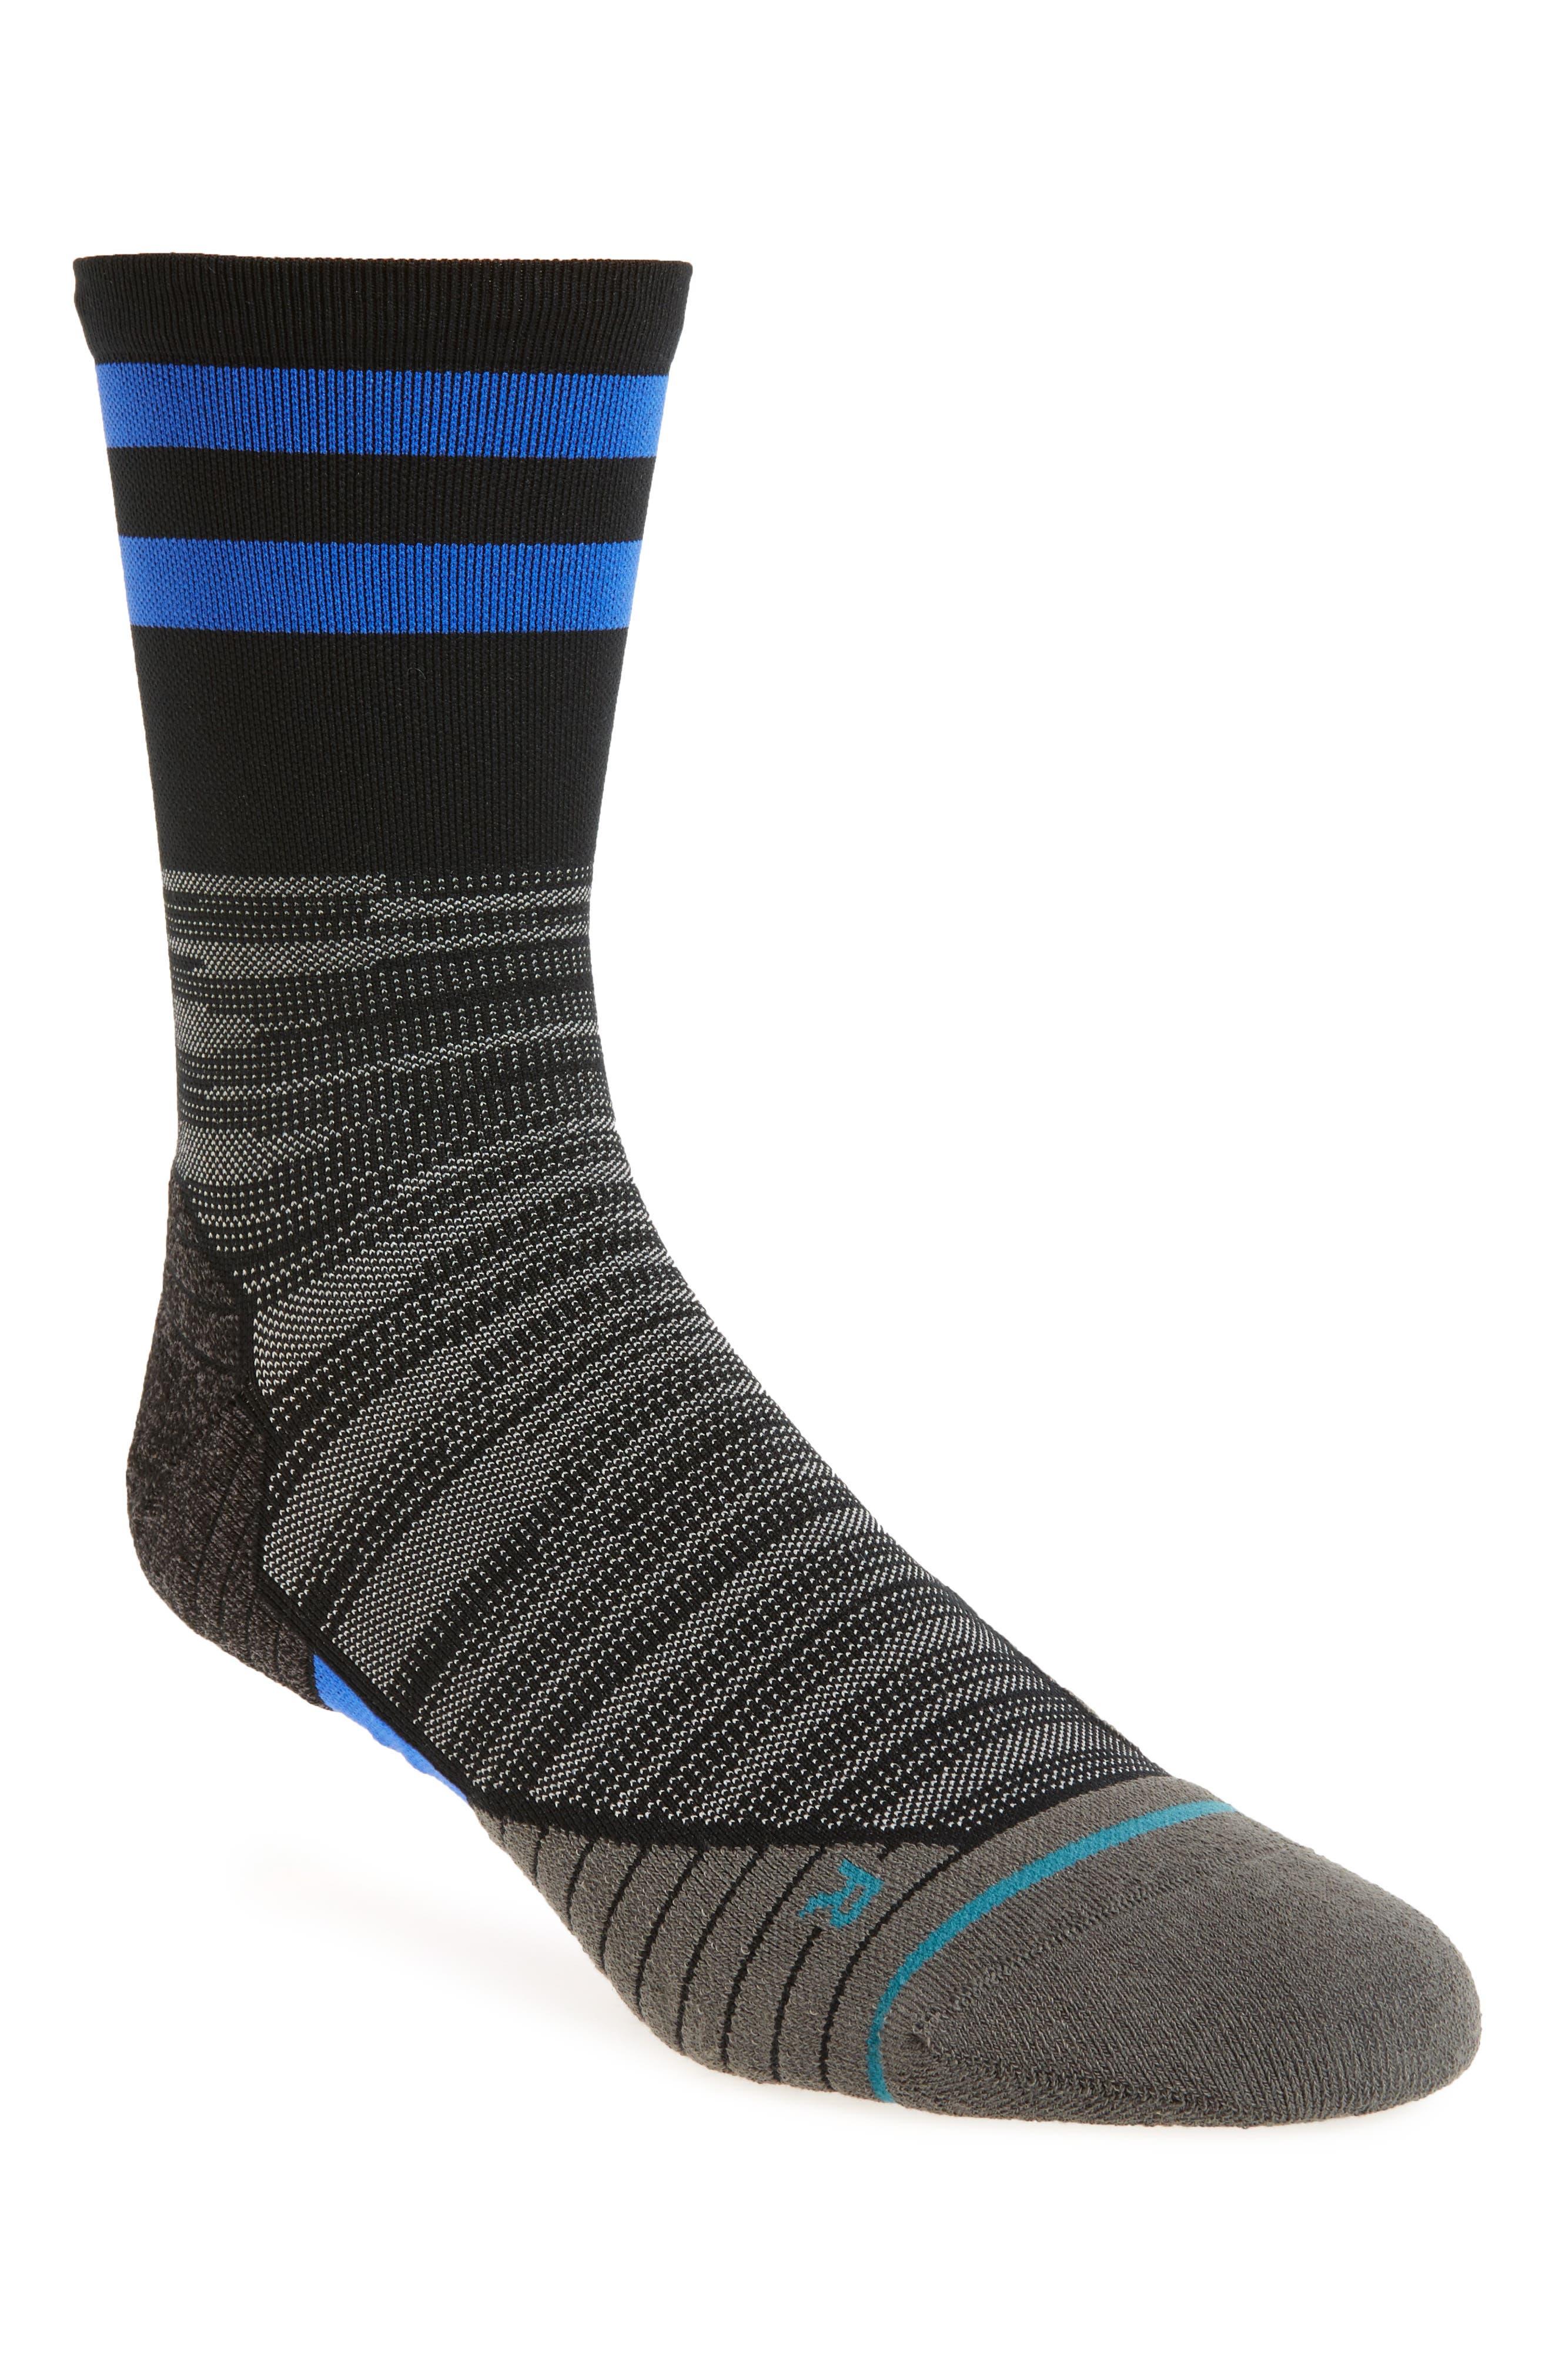 Main Image - Stance Uncommon Solids Crew Socks